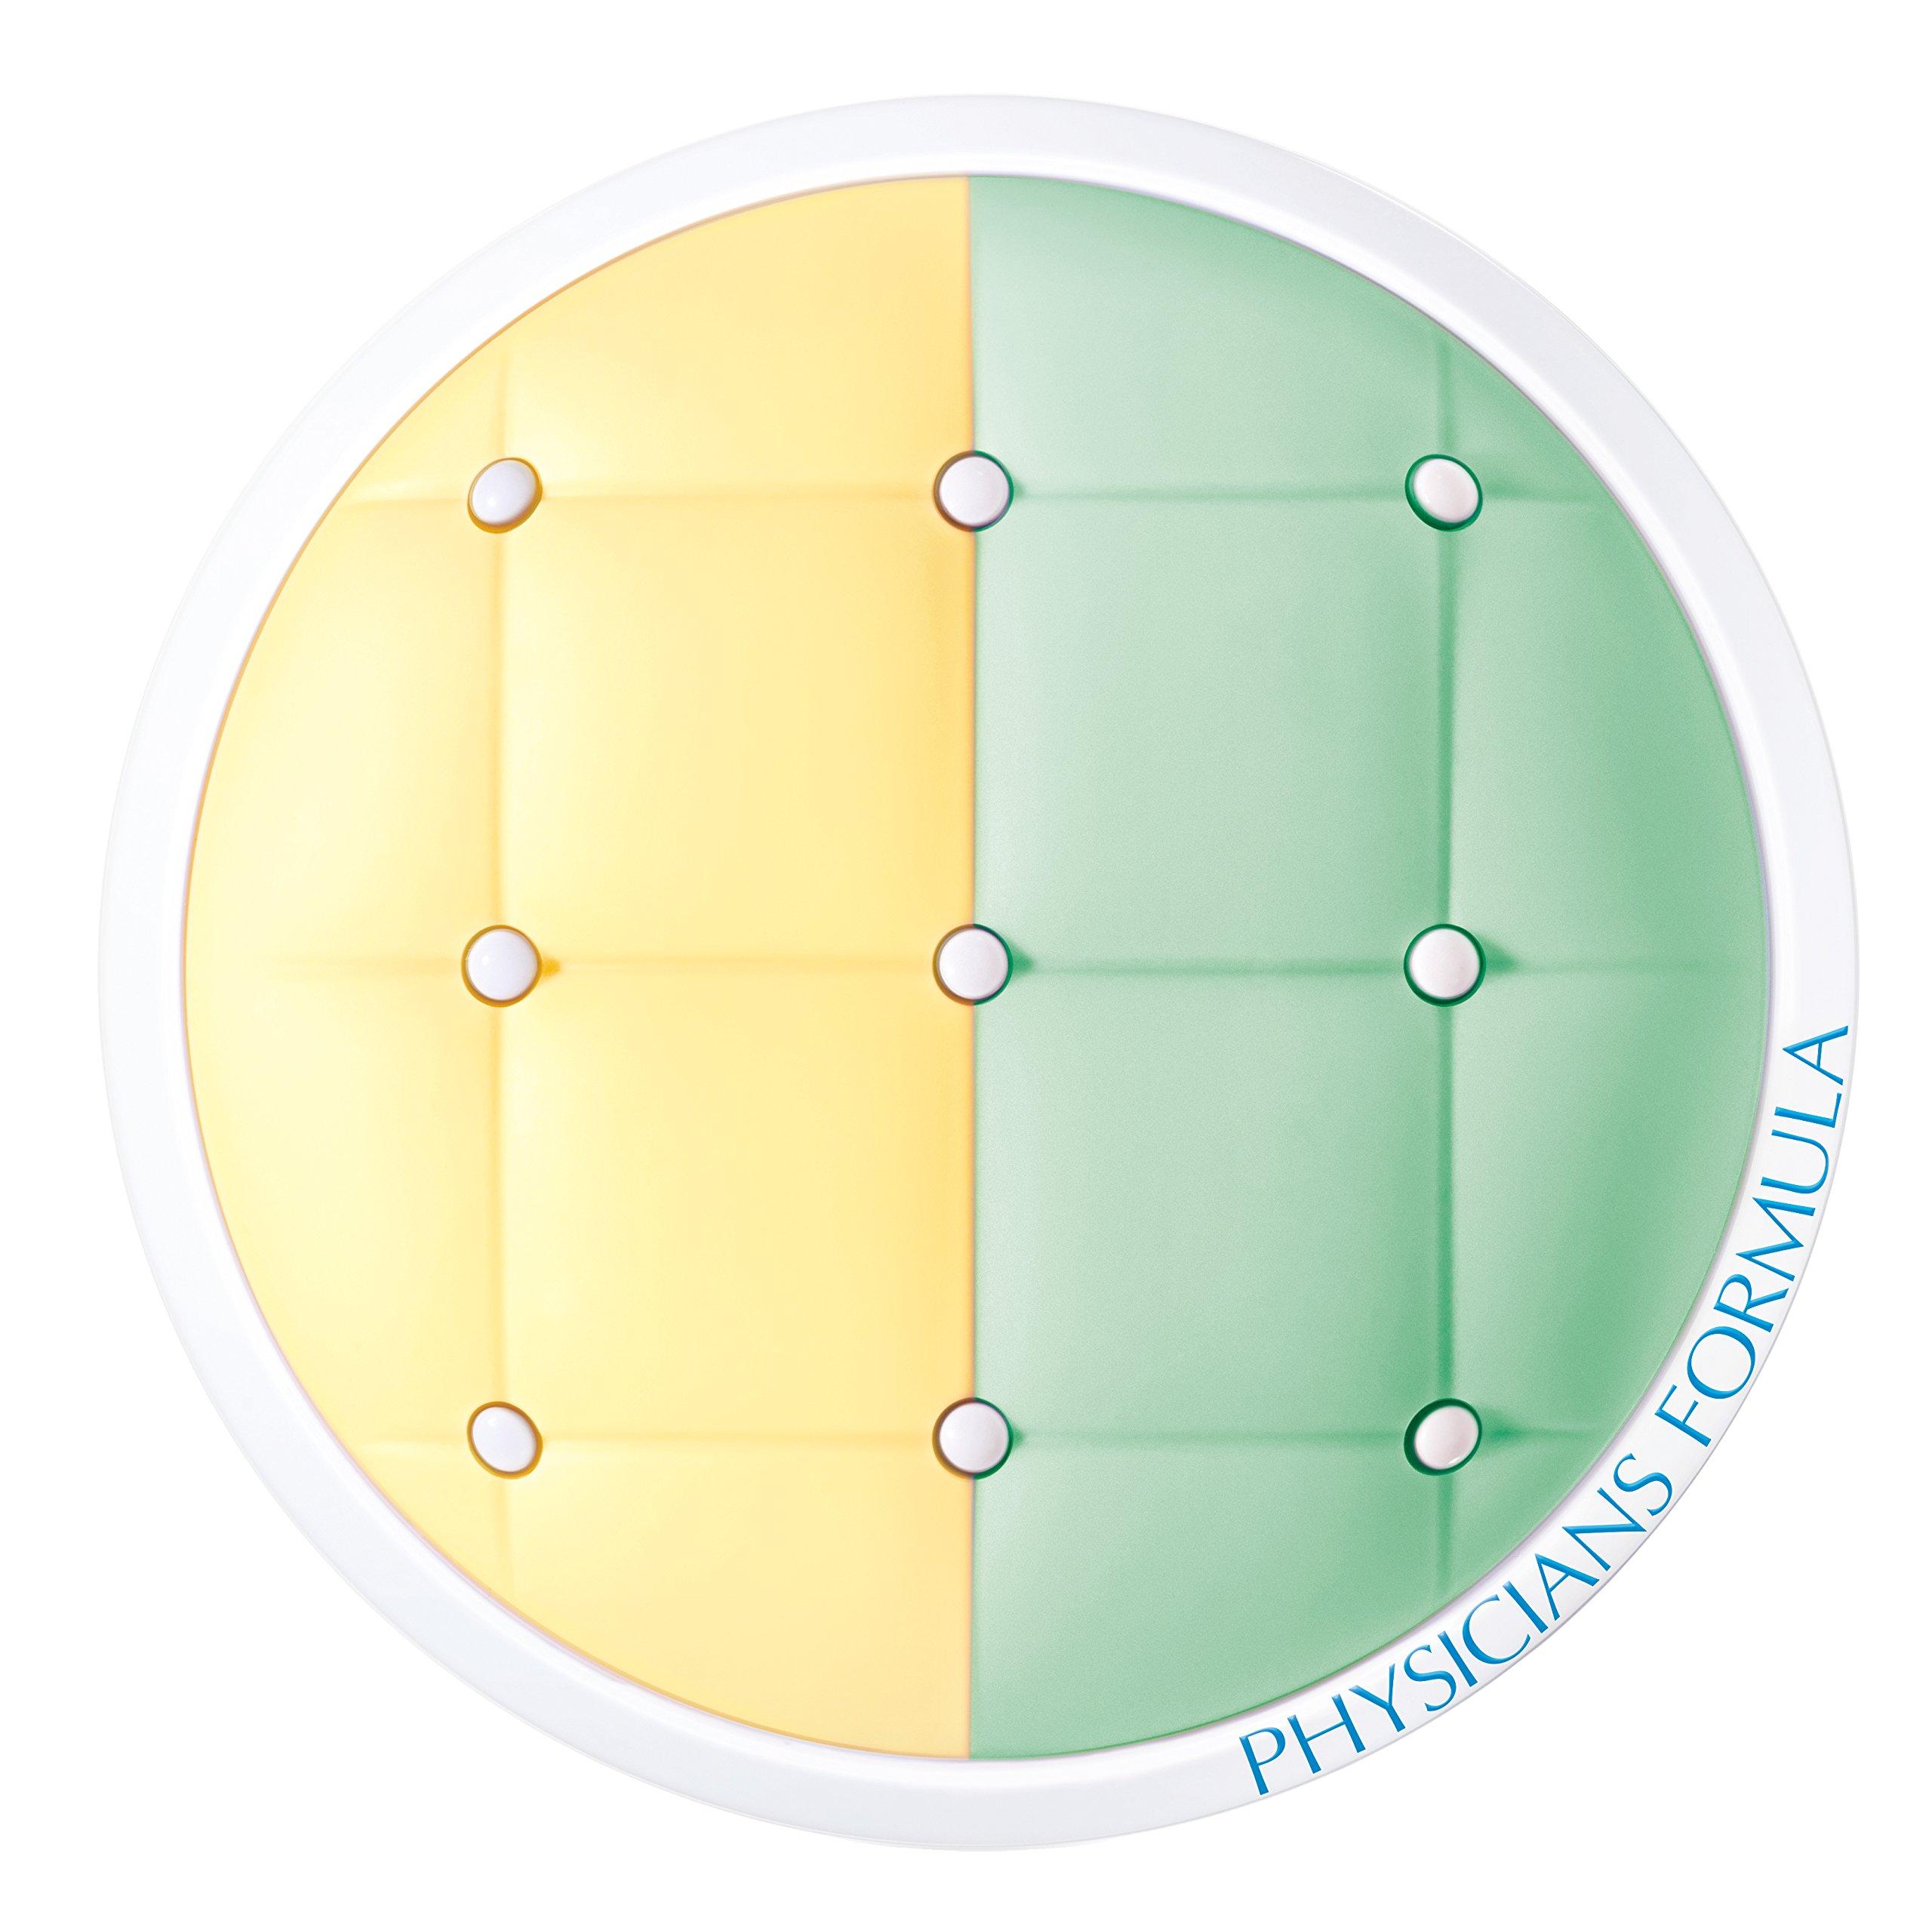 Physicians Formula Mineral Wear Cushion Corrector + Primer Duo, Yellow/Green, 0.33 Ounce